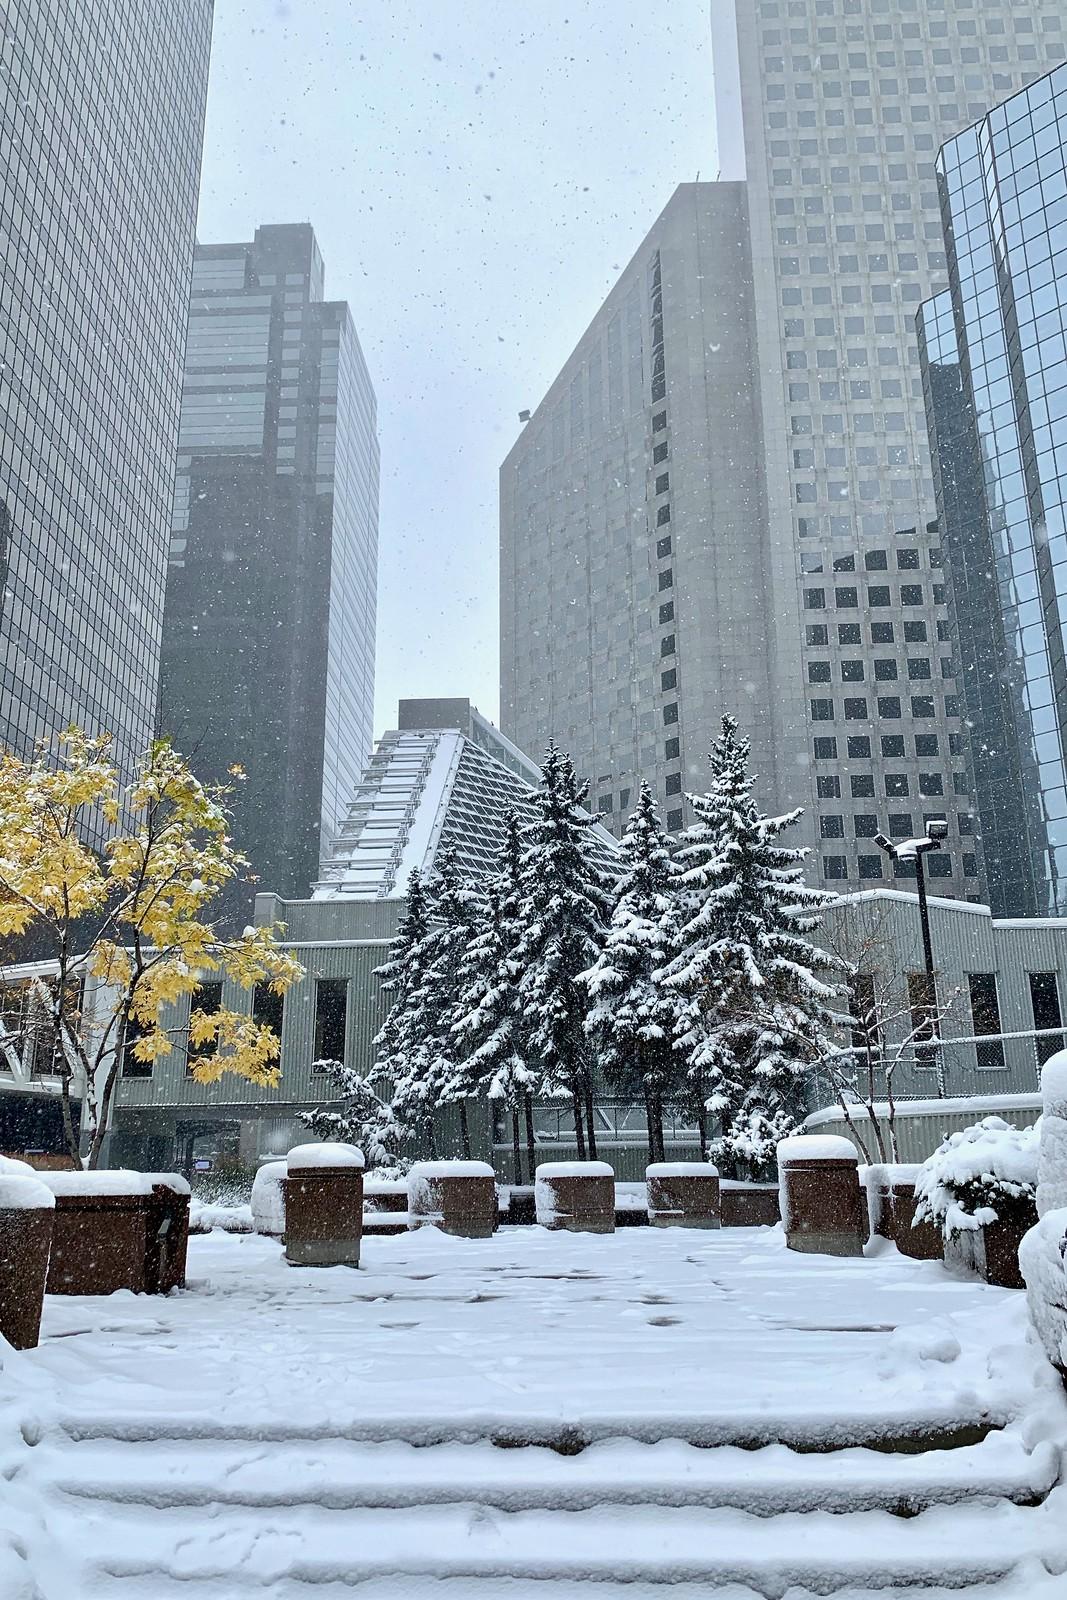 Shades of winter, Calgary, Alberta, Canada